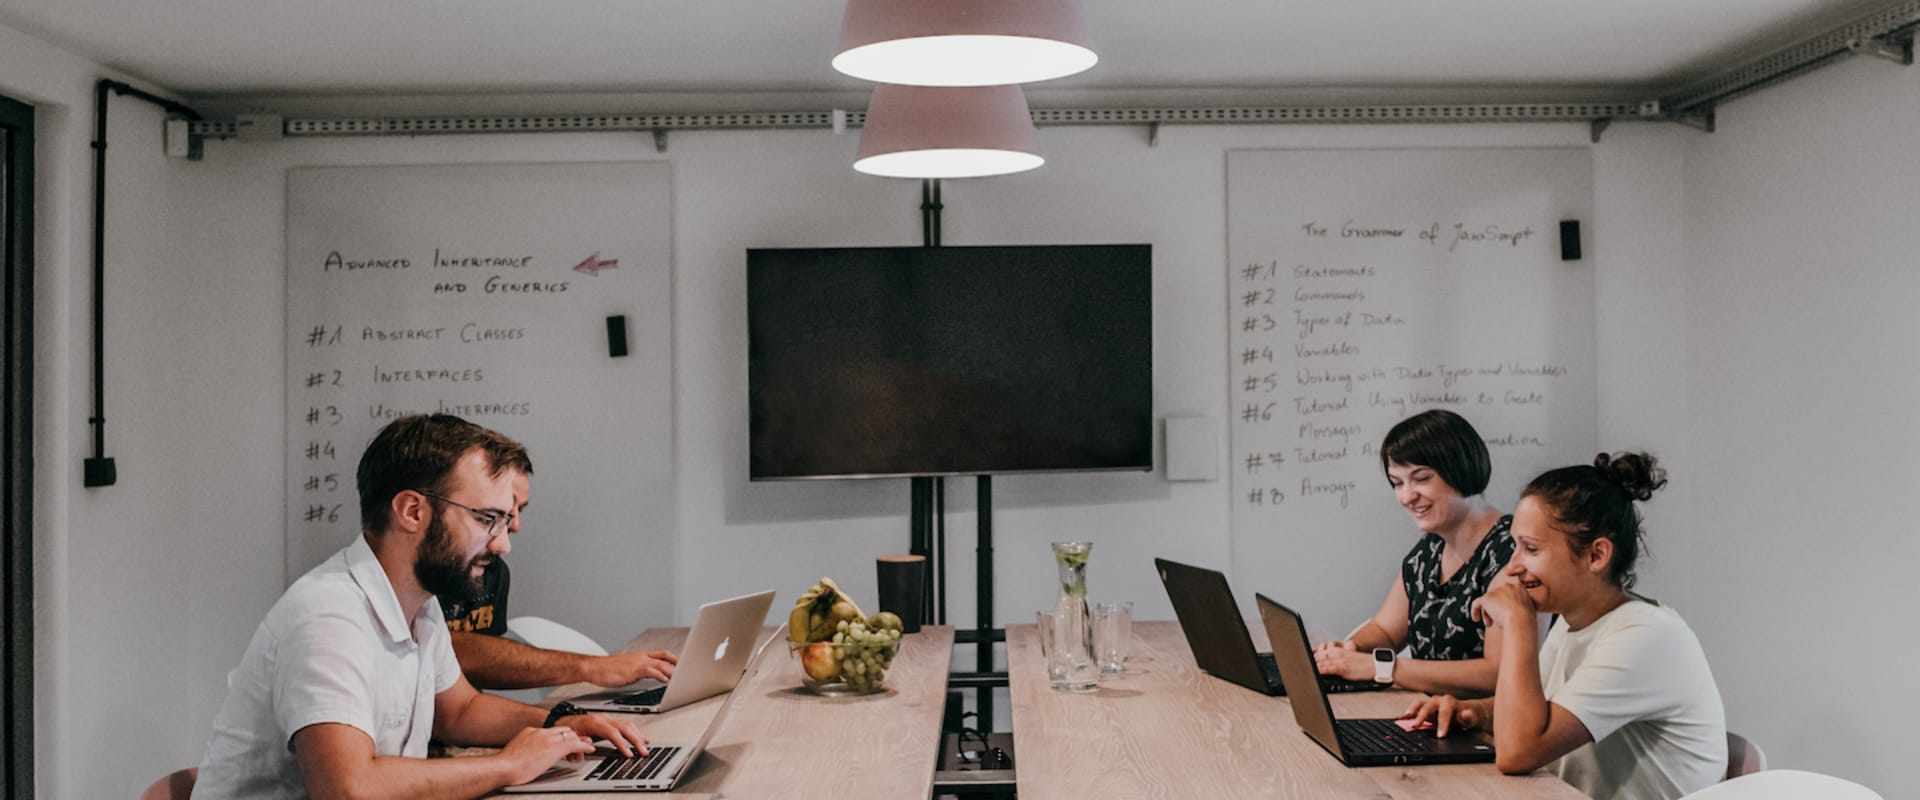 Vanity Metrics vs Actionable Metrics - Lean Startup | Boldare